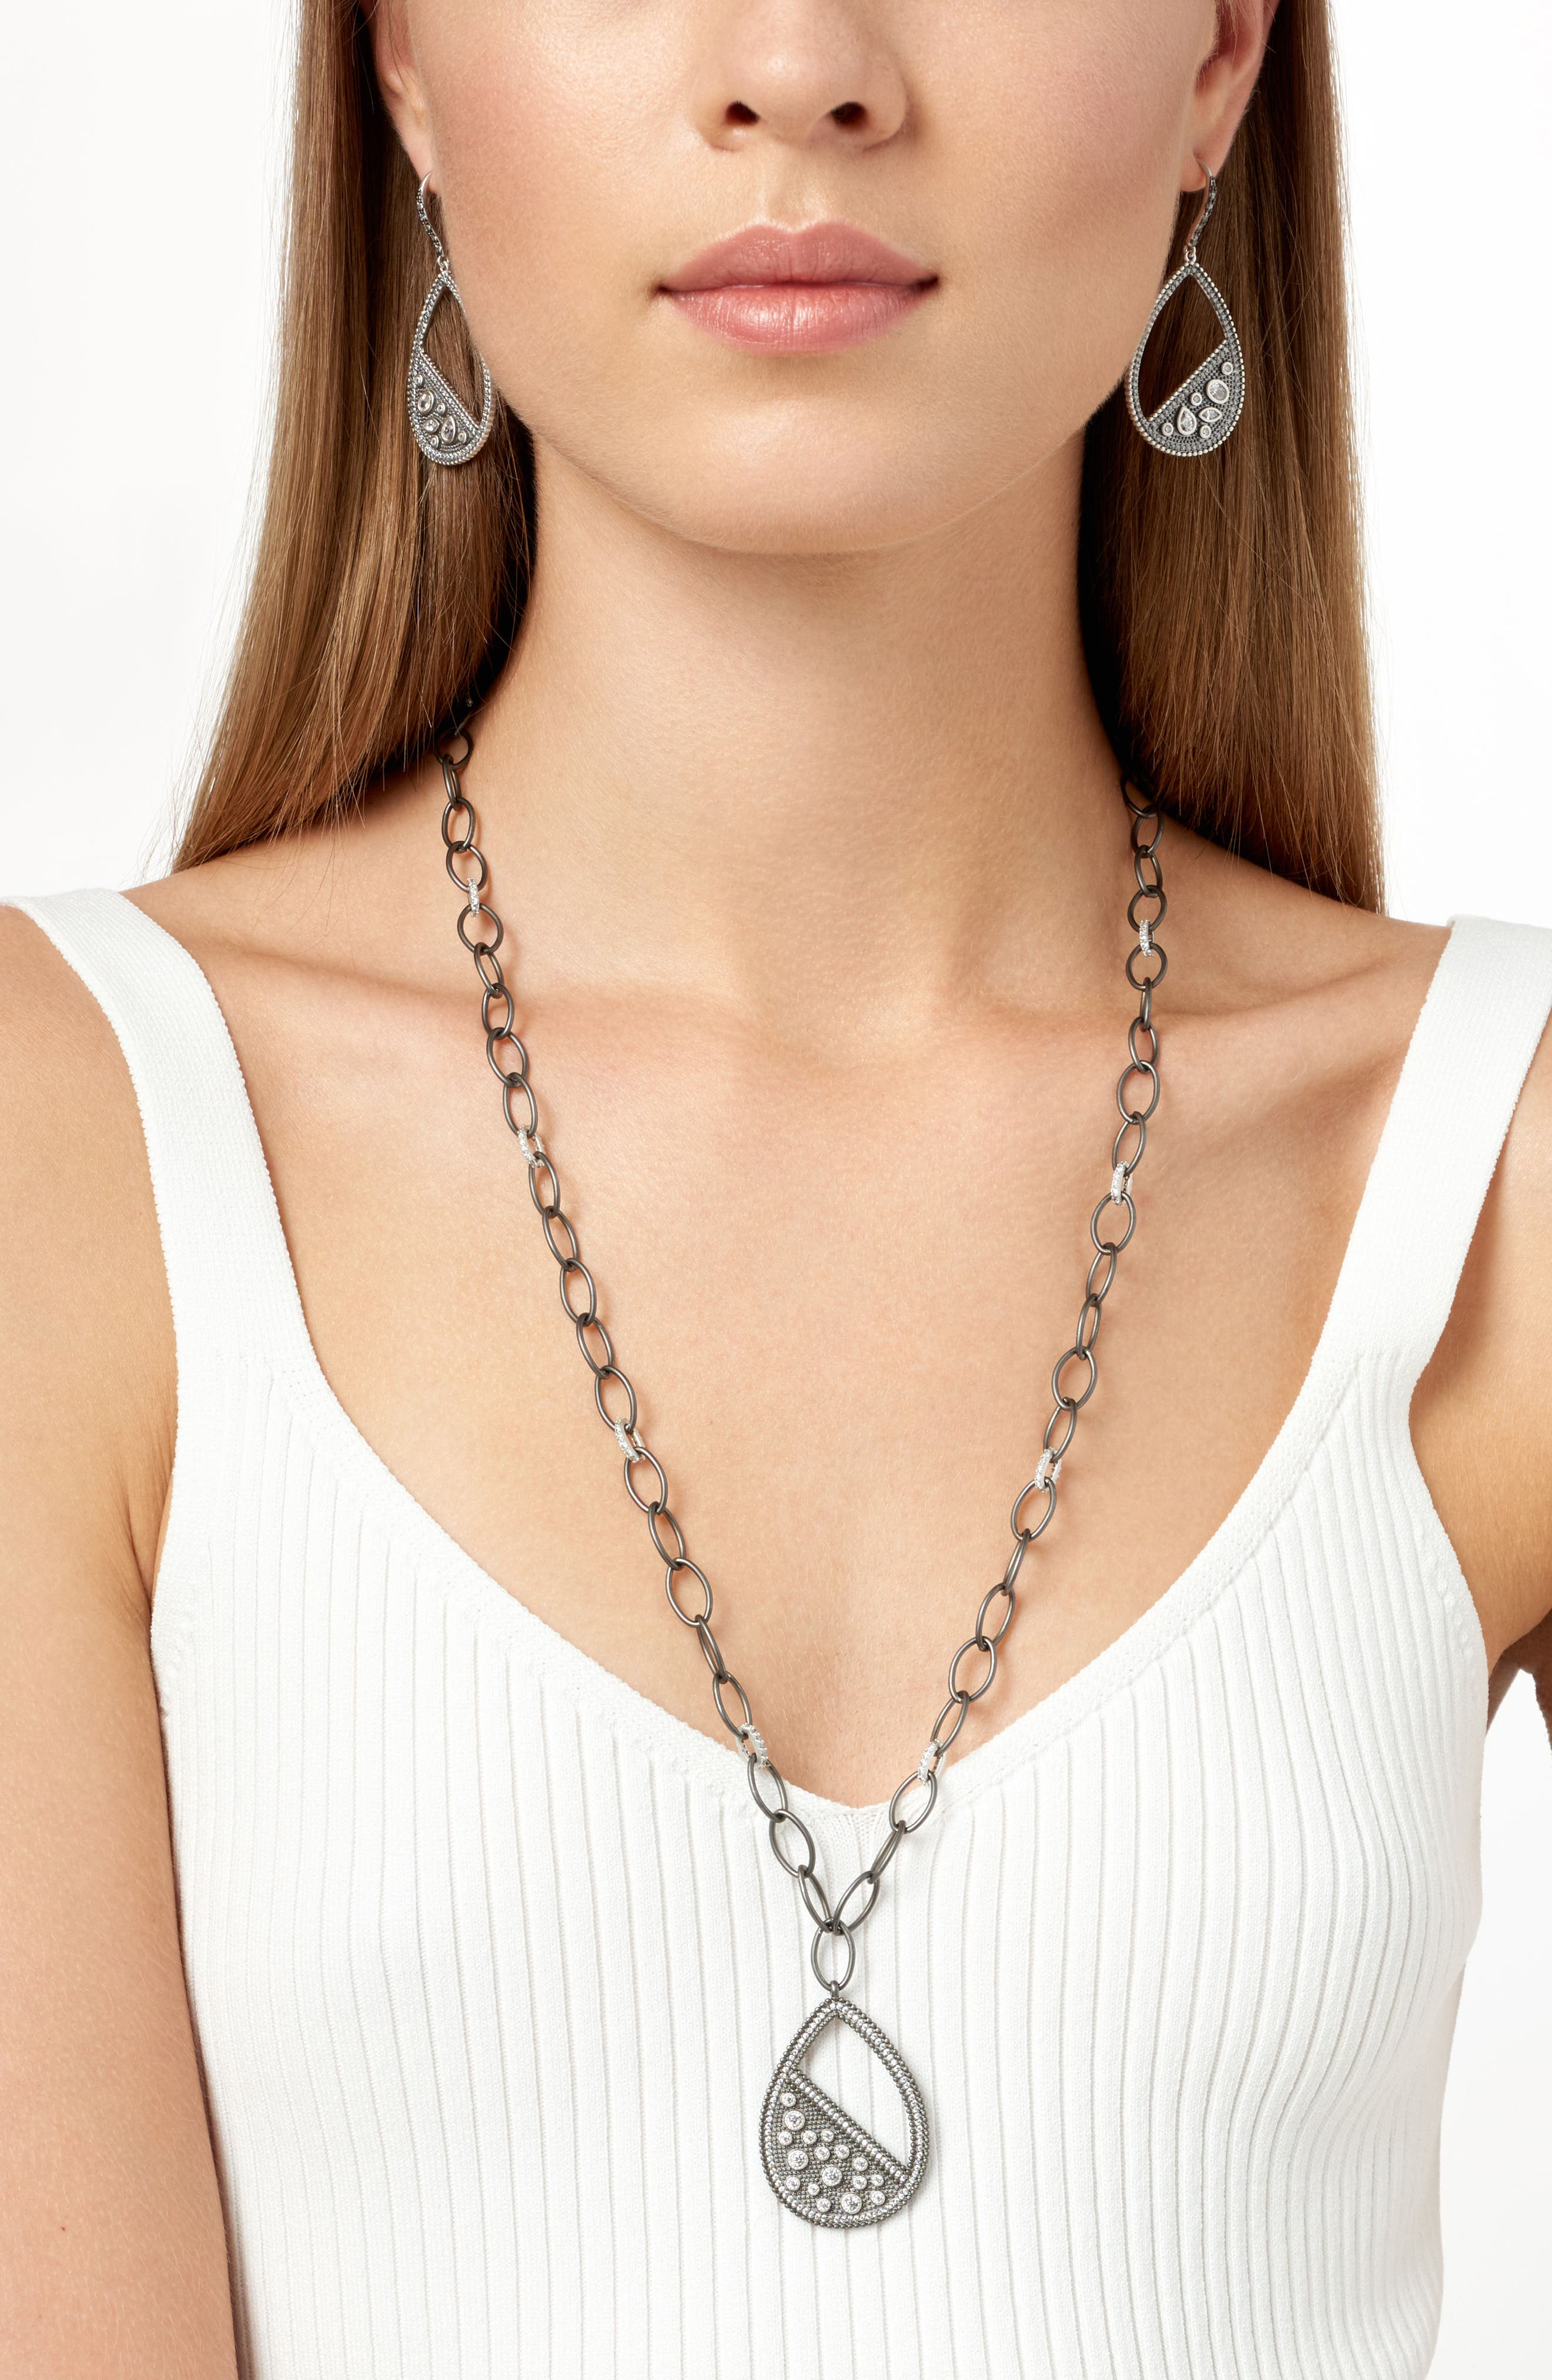 Industrial Finish Teardrop Necklace,                             Alternate thumbnail 3, color,                             Silver/ Black Rhodium